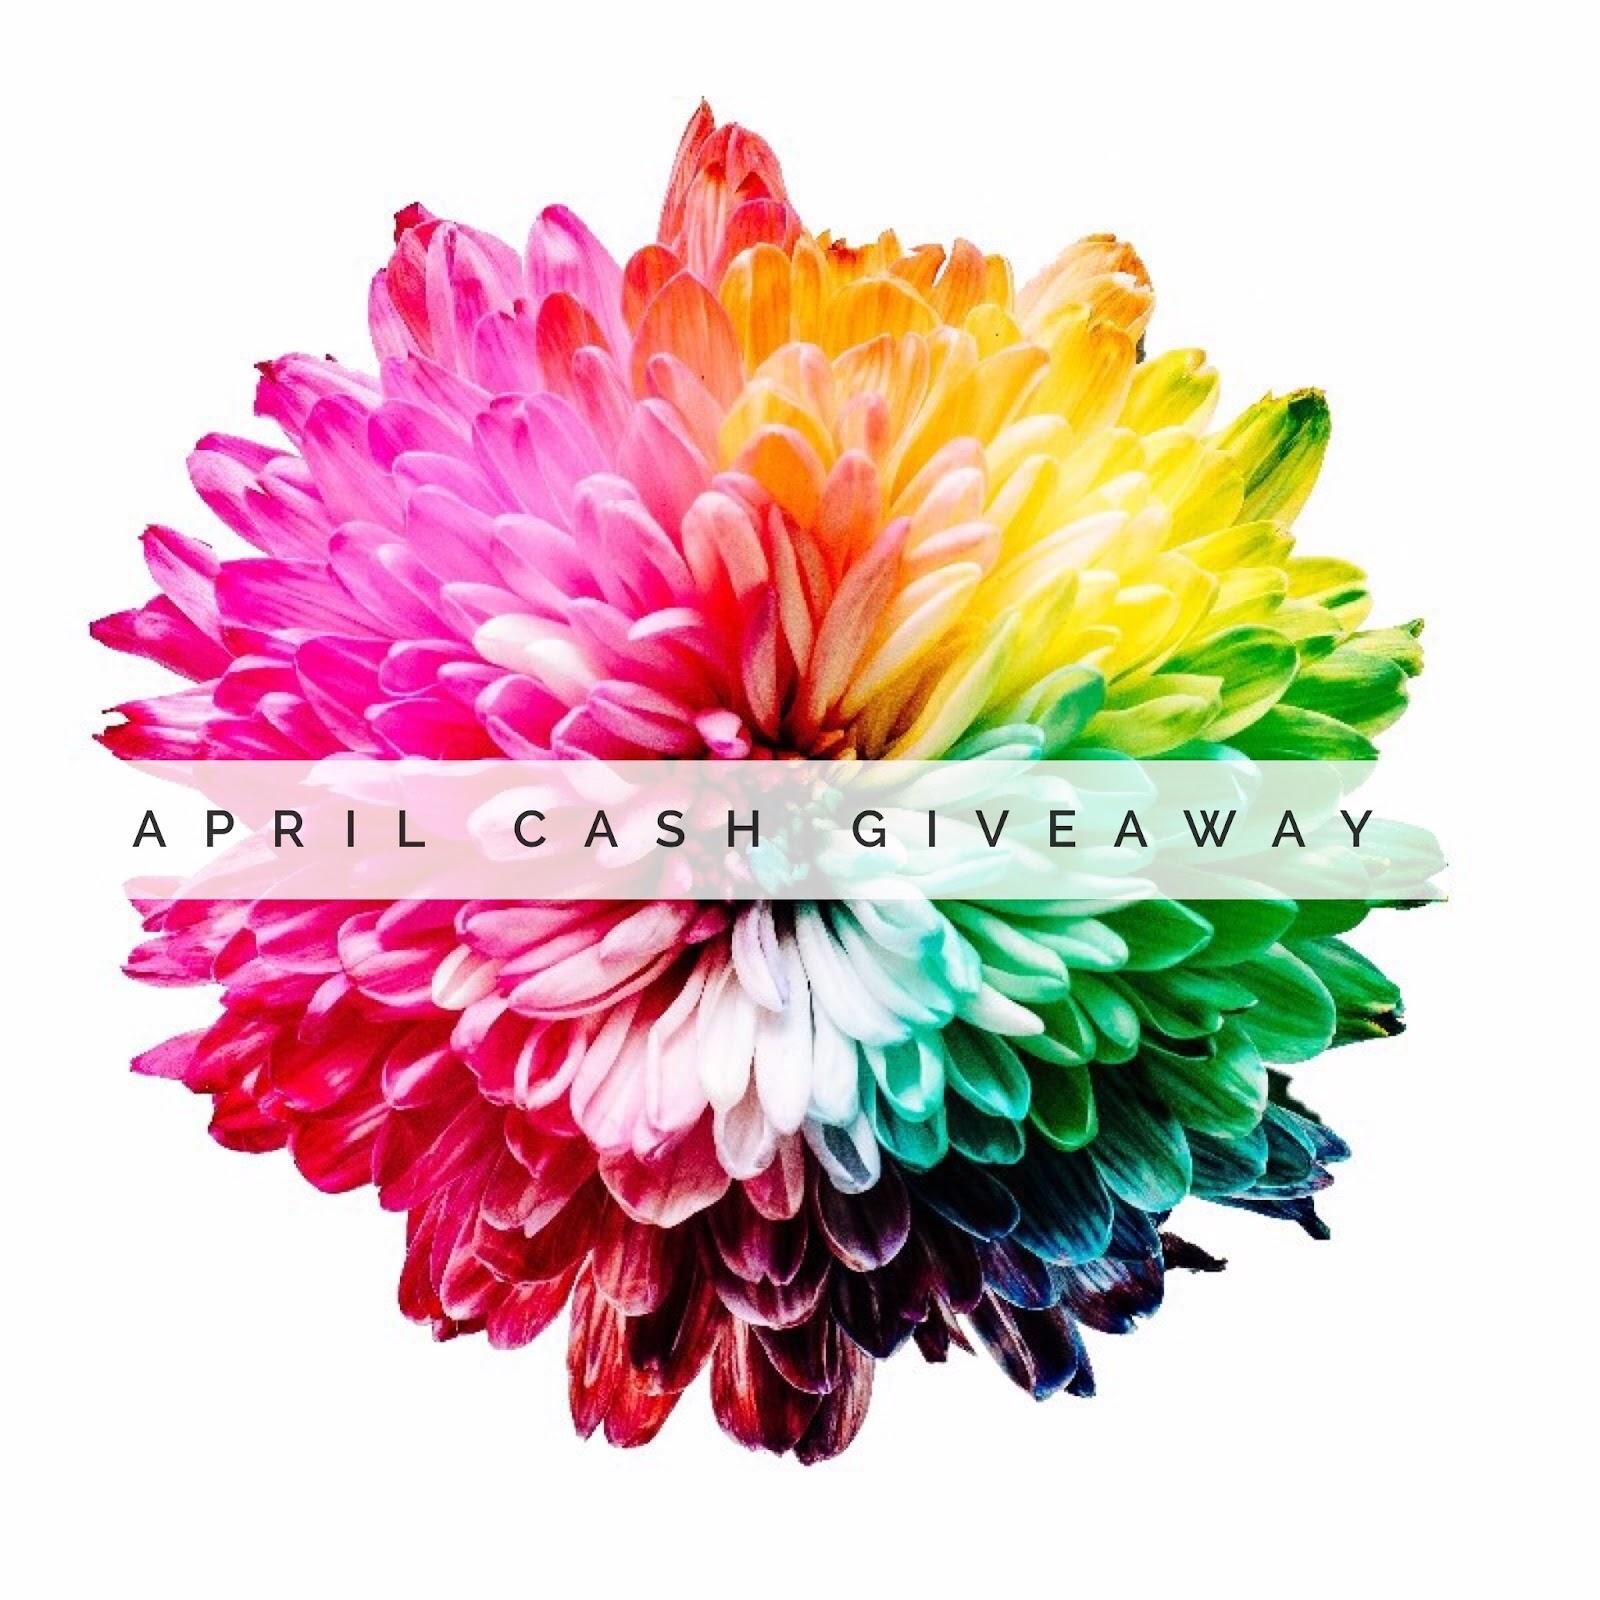 $150 Cash Giveaway